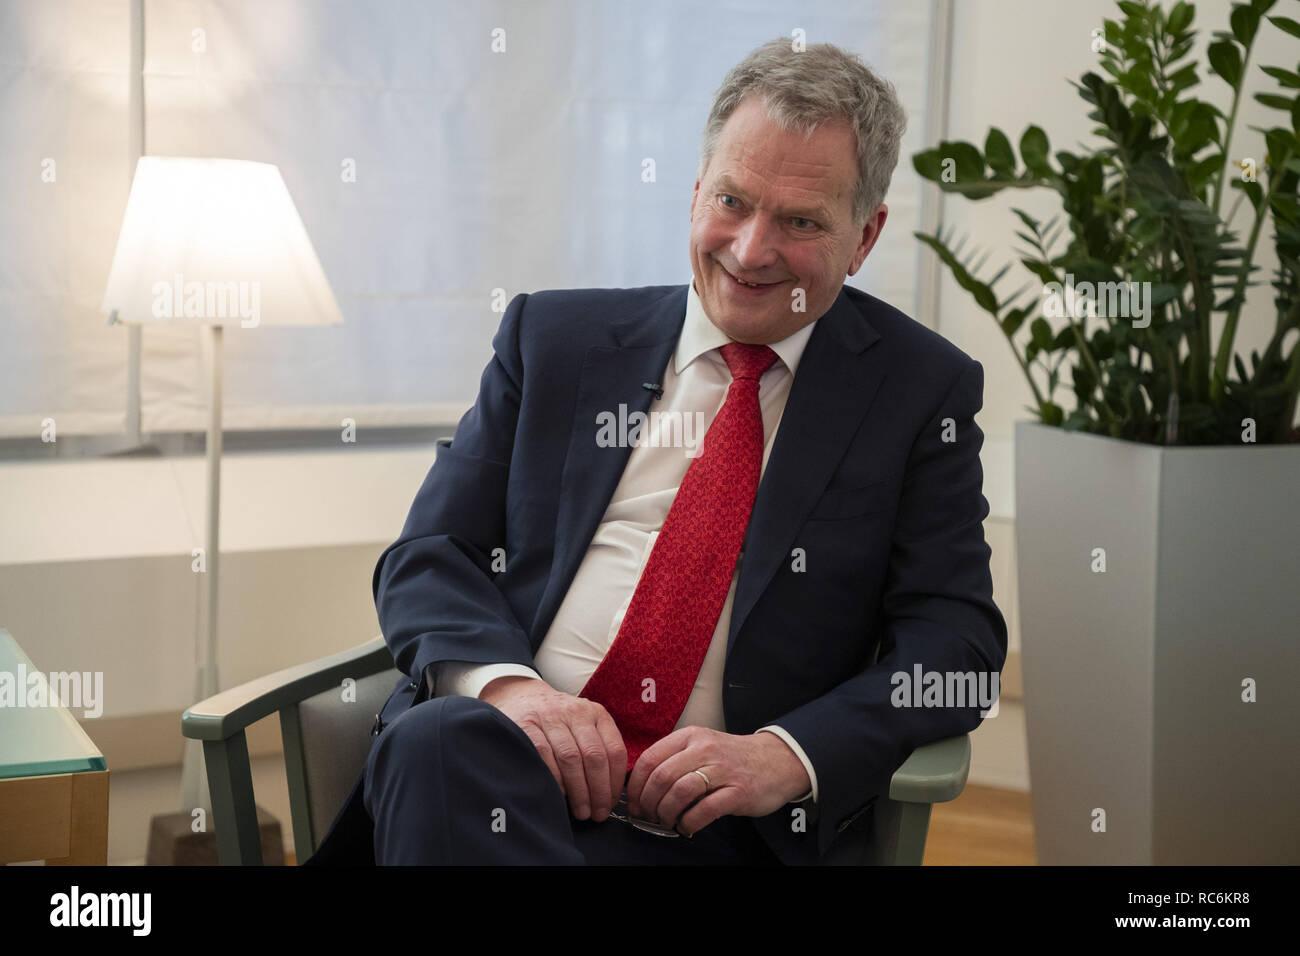 Helsinki, Finland. 11th Jan, 2019. Finnish President Sauli Niinisto speaks during an interview with Xinhua in Helsinki, Finland, Jan. 11, 2019. Credit: Matti Matikainen/Xinhua/Alamy Live News - Stock Image